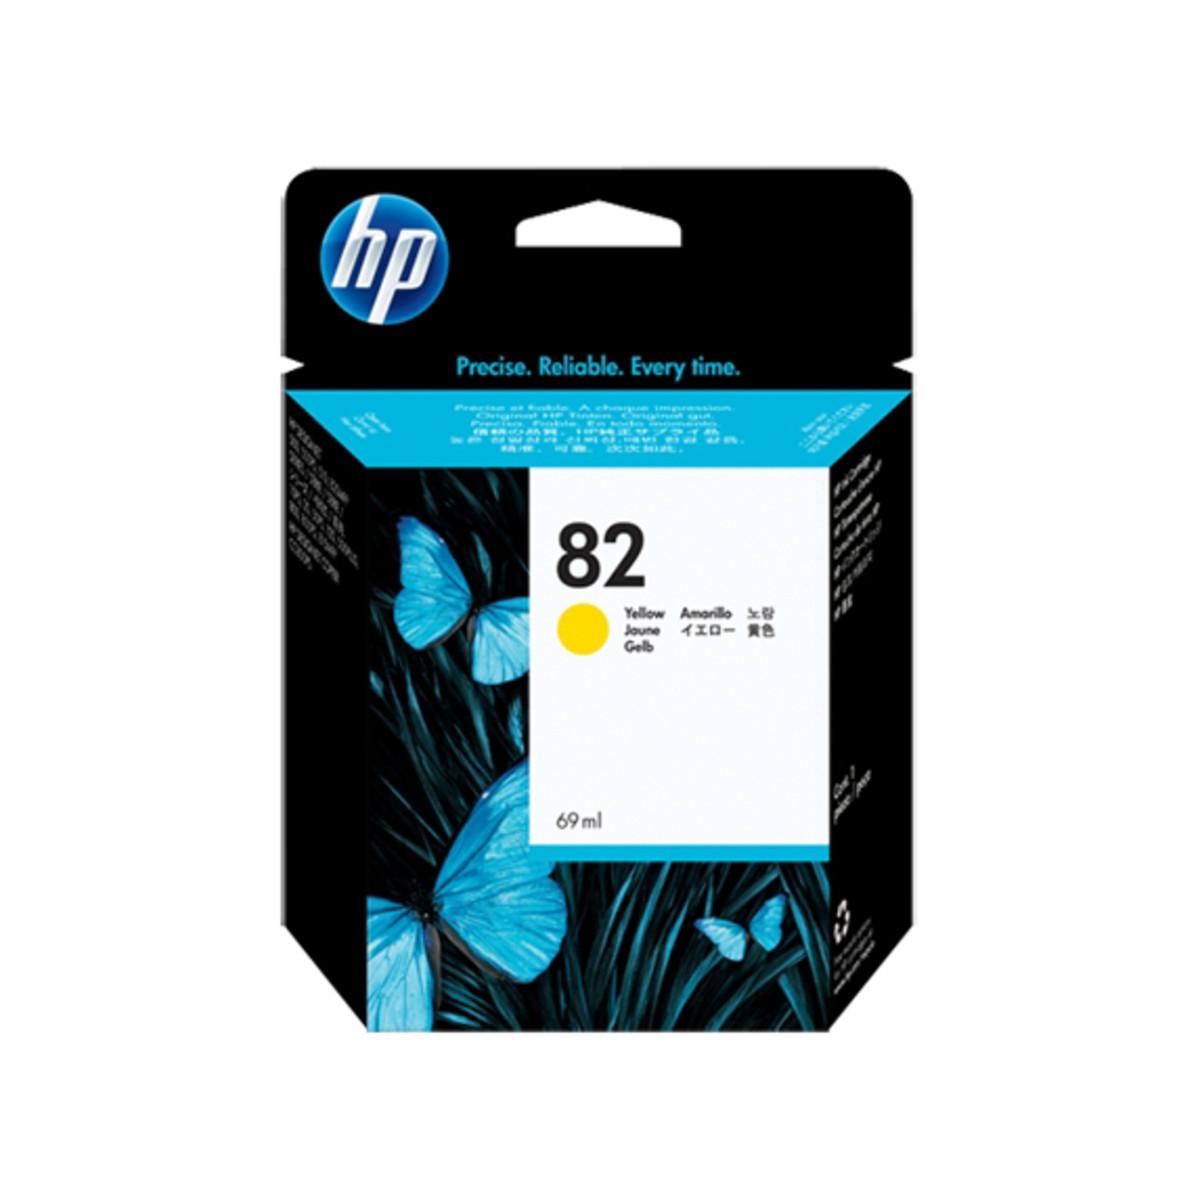 HP 82 (C4913A) Yellow Ink Cartridge